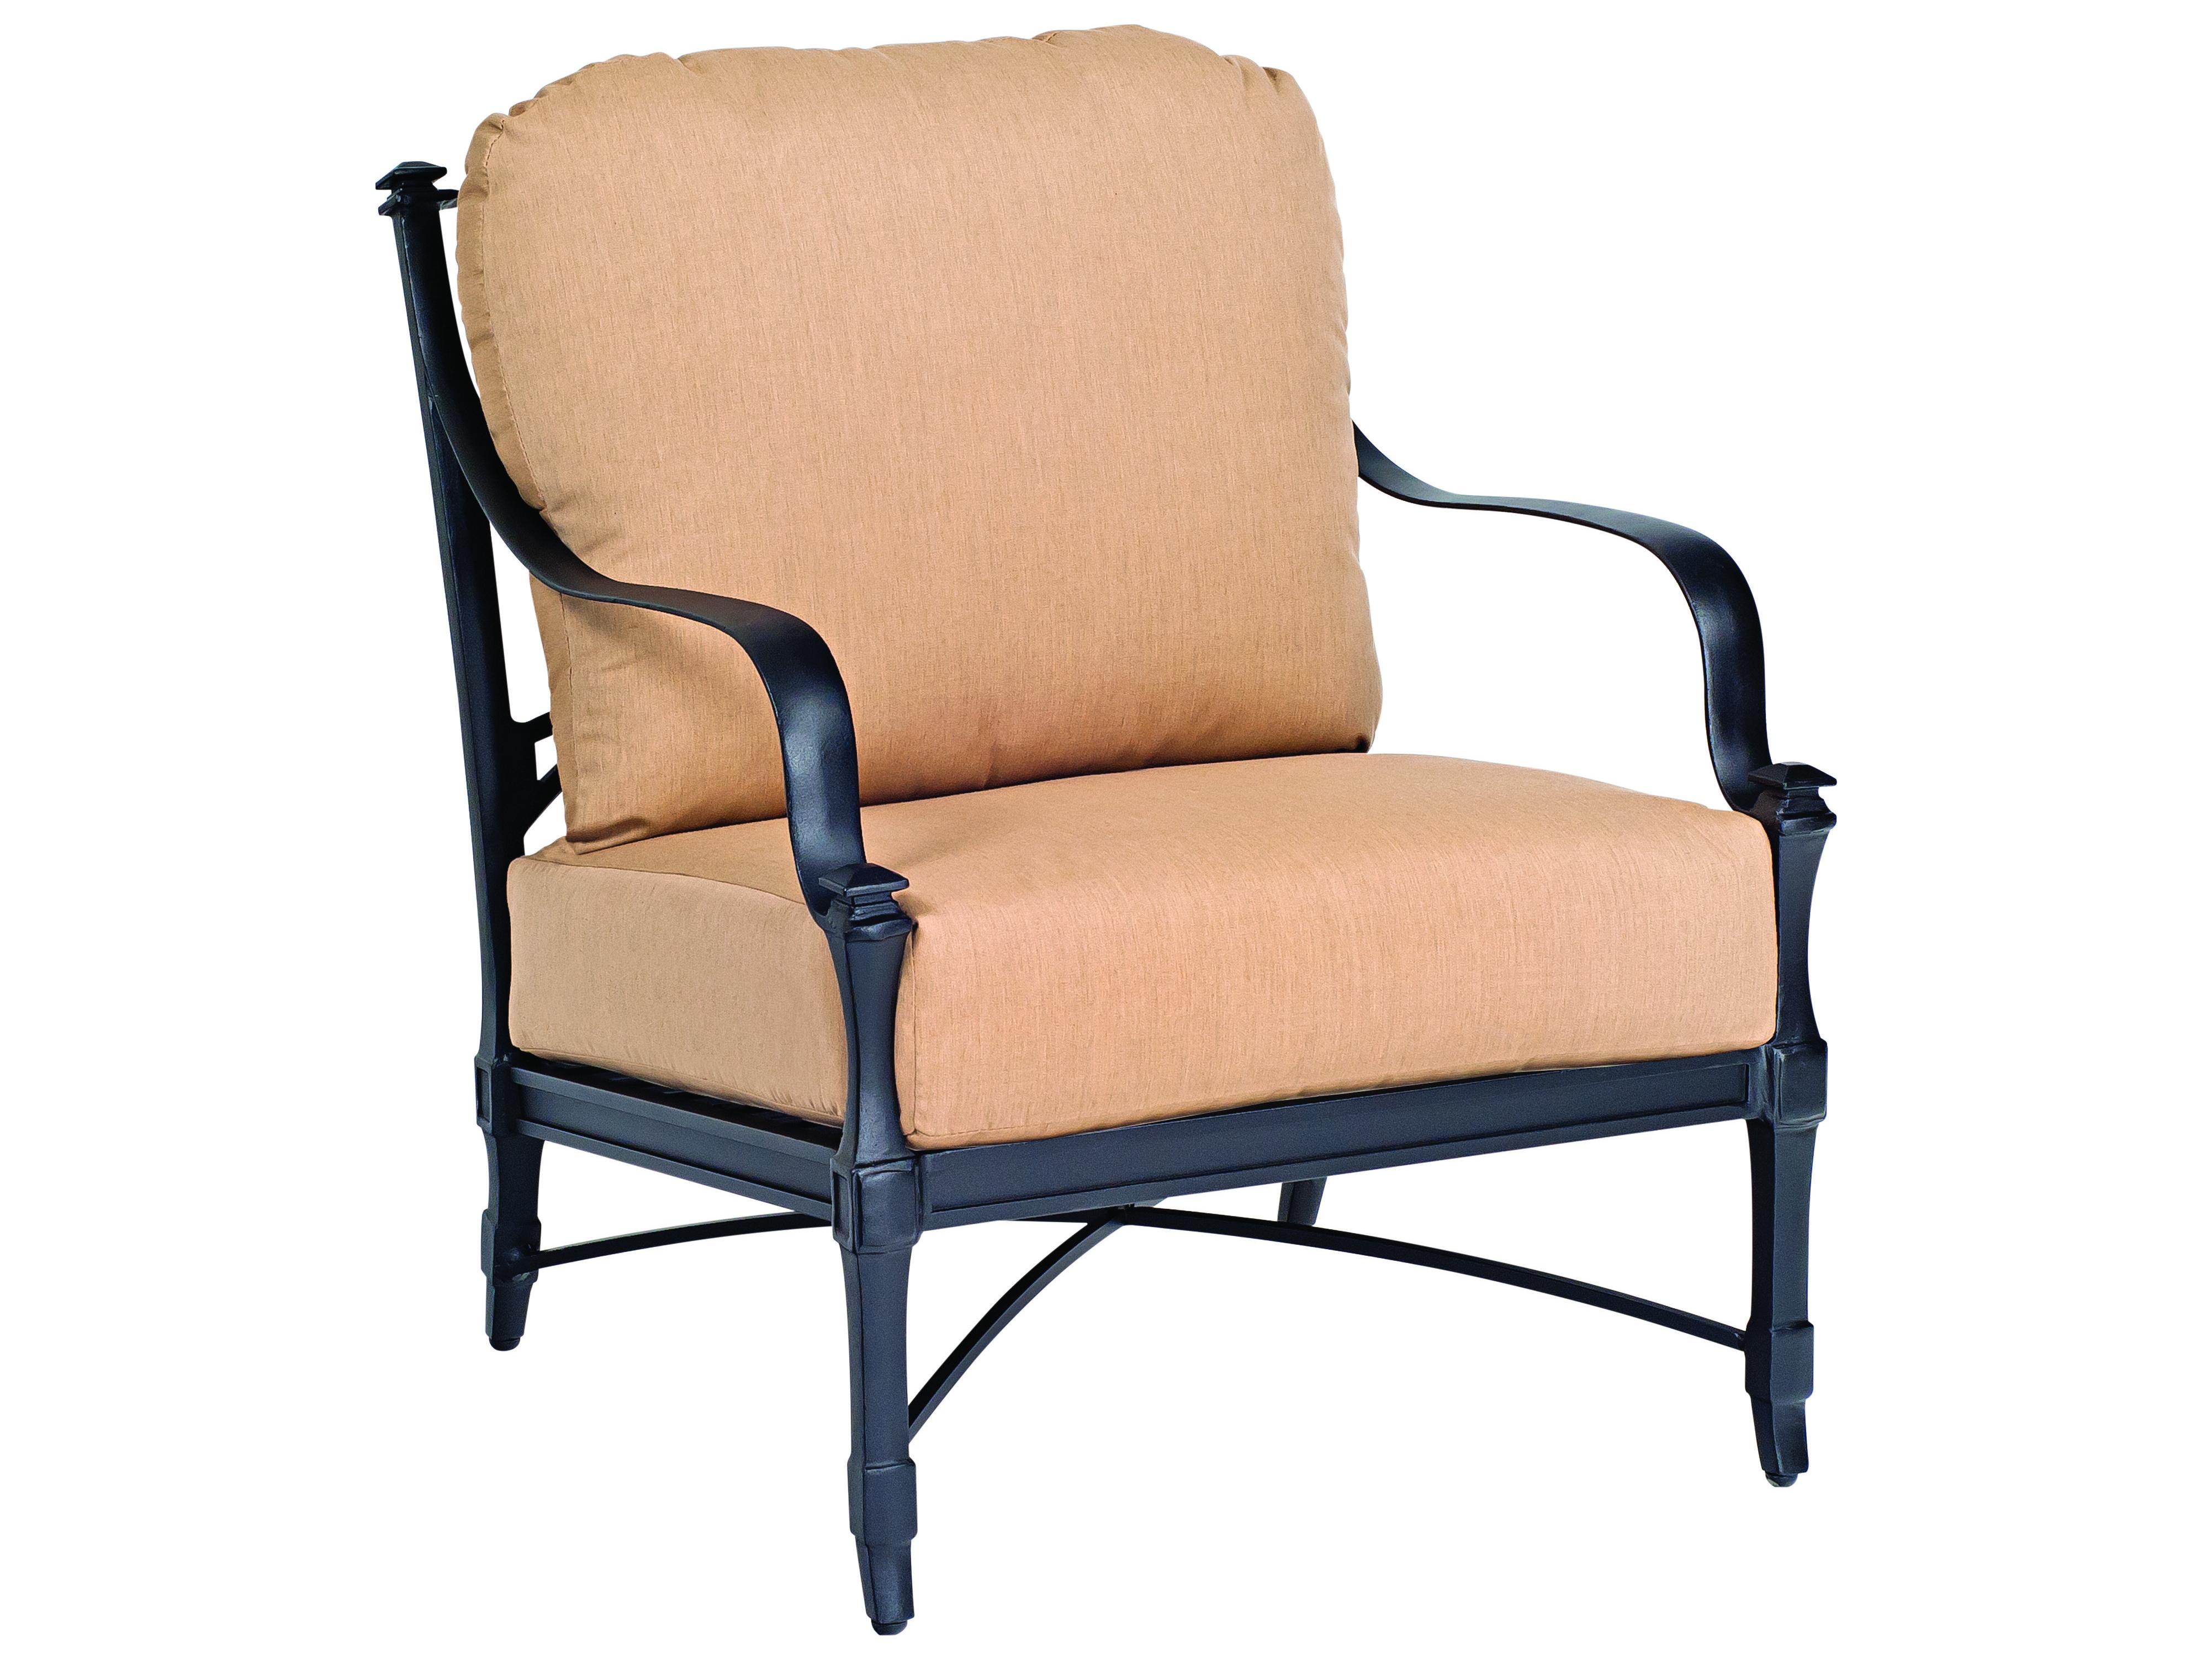 Woodard Isla Lounge Chair Replacement Cushions